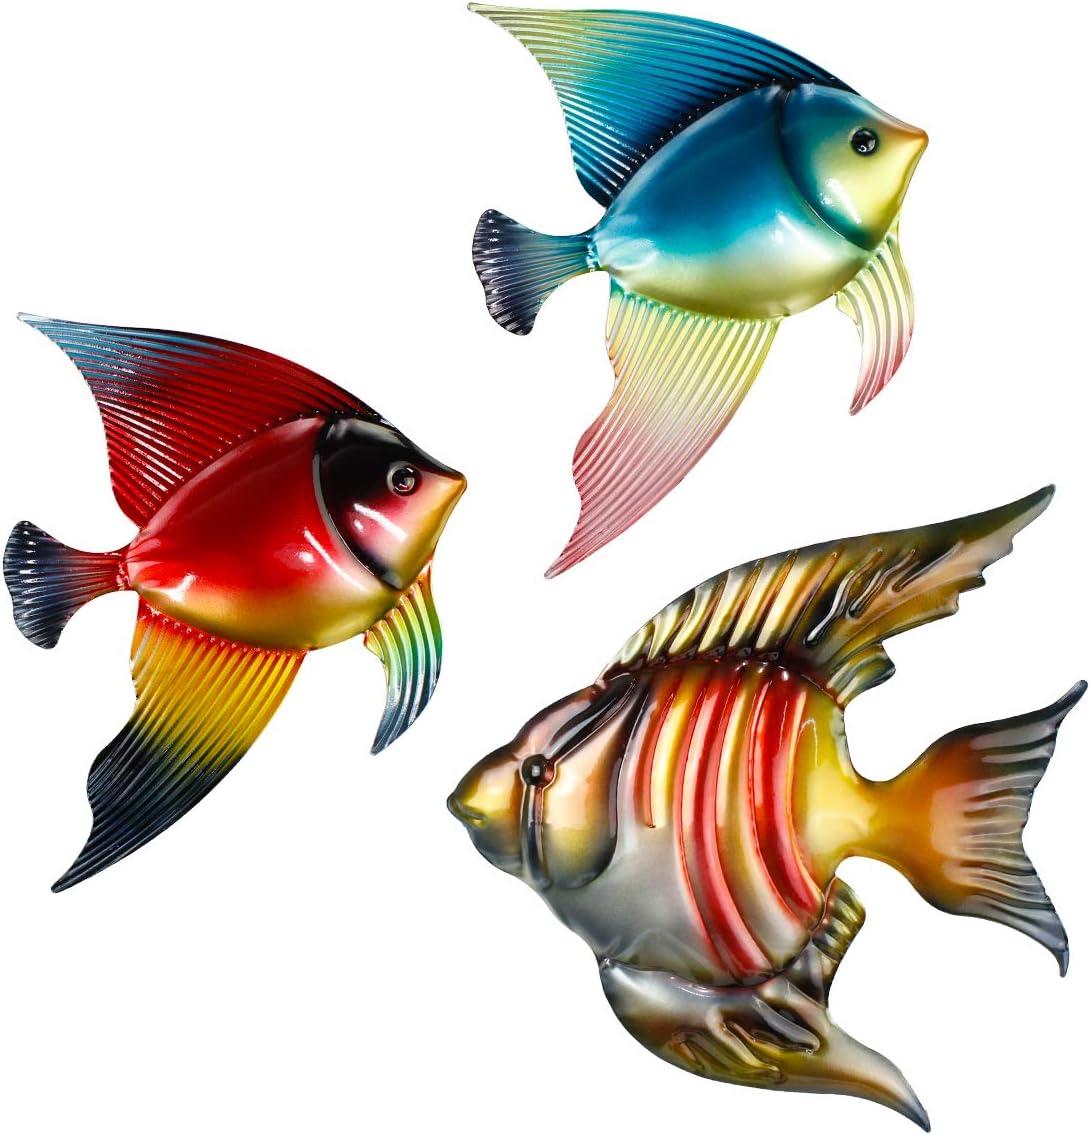 FANWNKI Set of 3 Metal Fish Wall Decor Art Outdoor Indoor Sculpture Hanging for Pool Home Porch Fence Garden